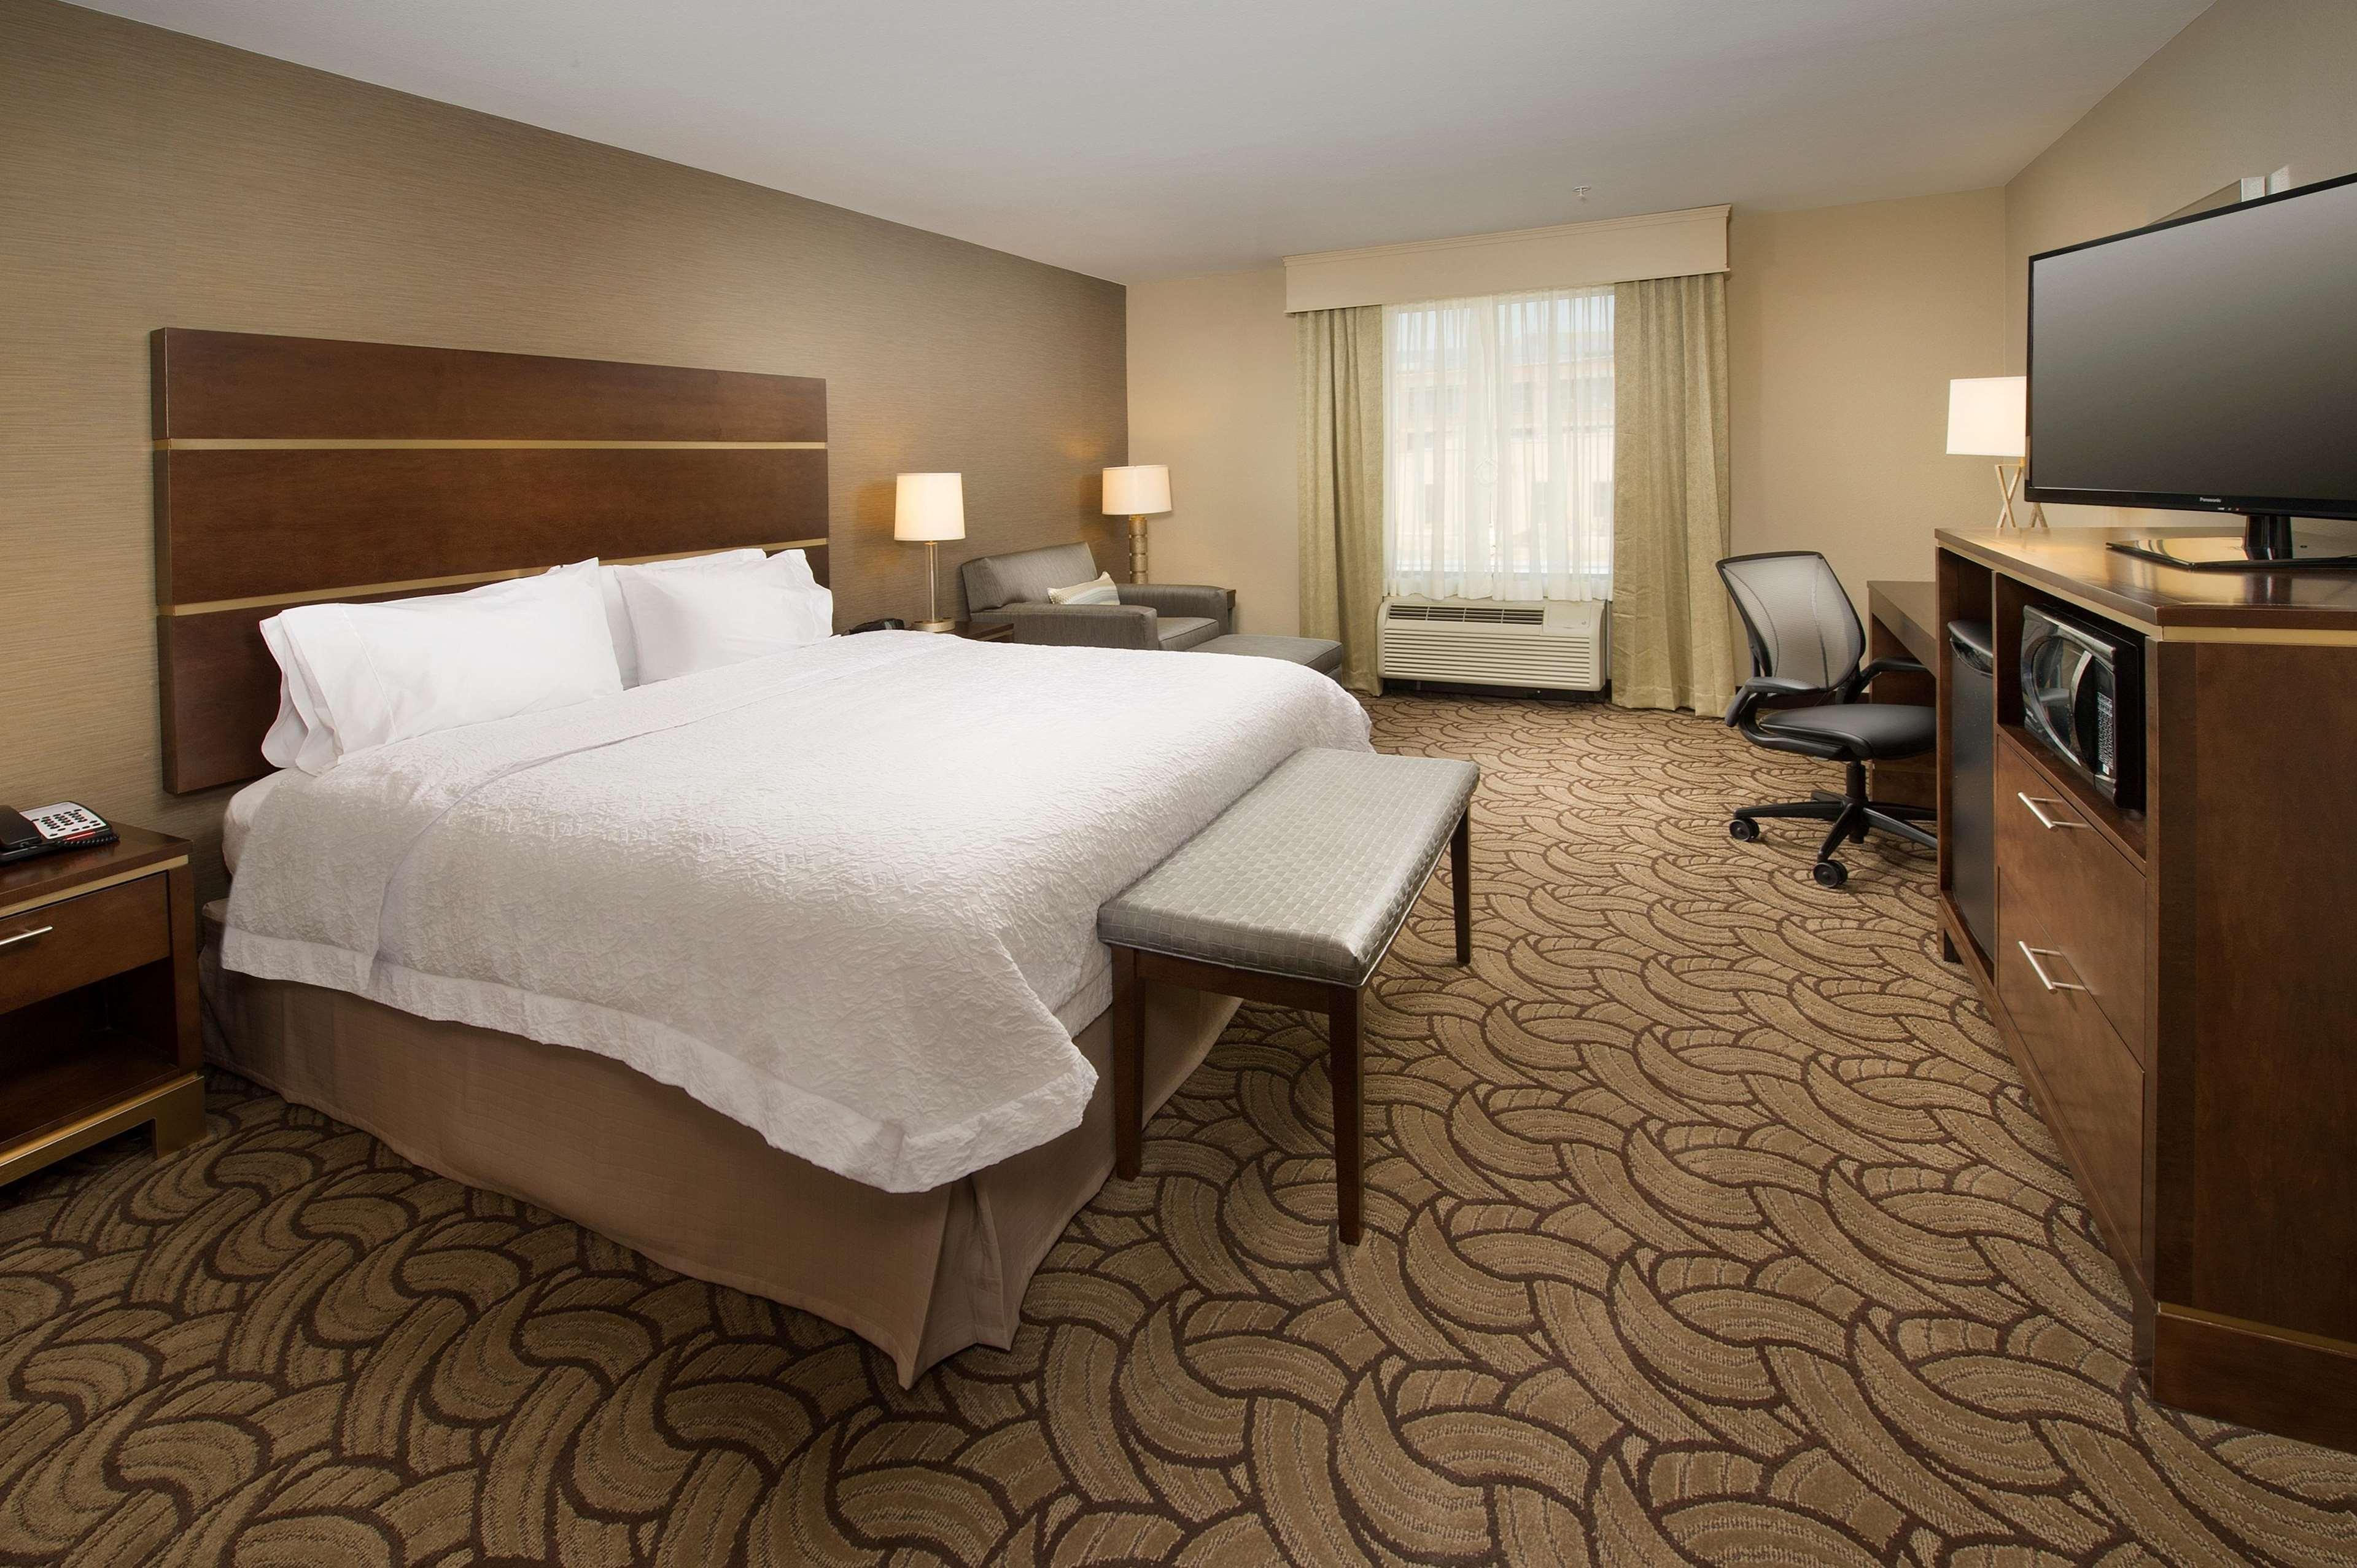 Hampton Inn & Suites San Antonio-Downtown/Market Square image 10